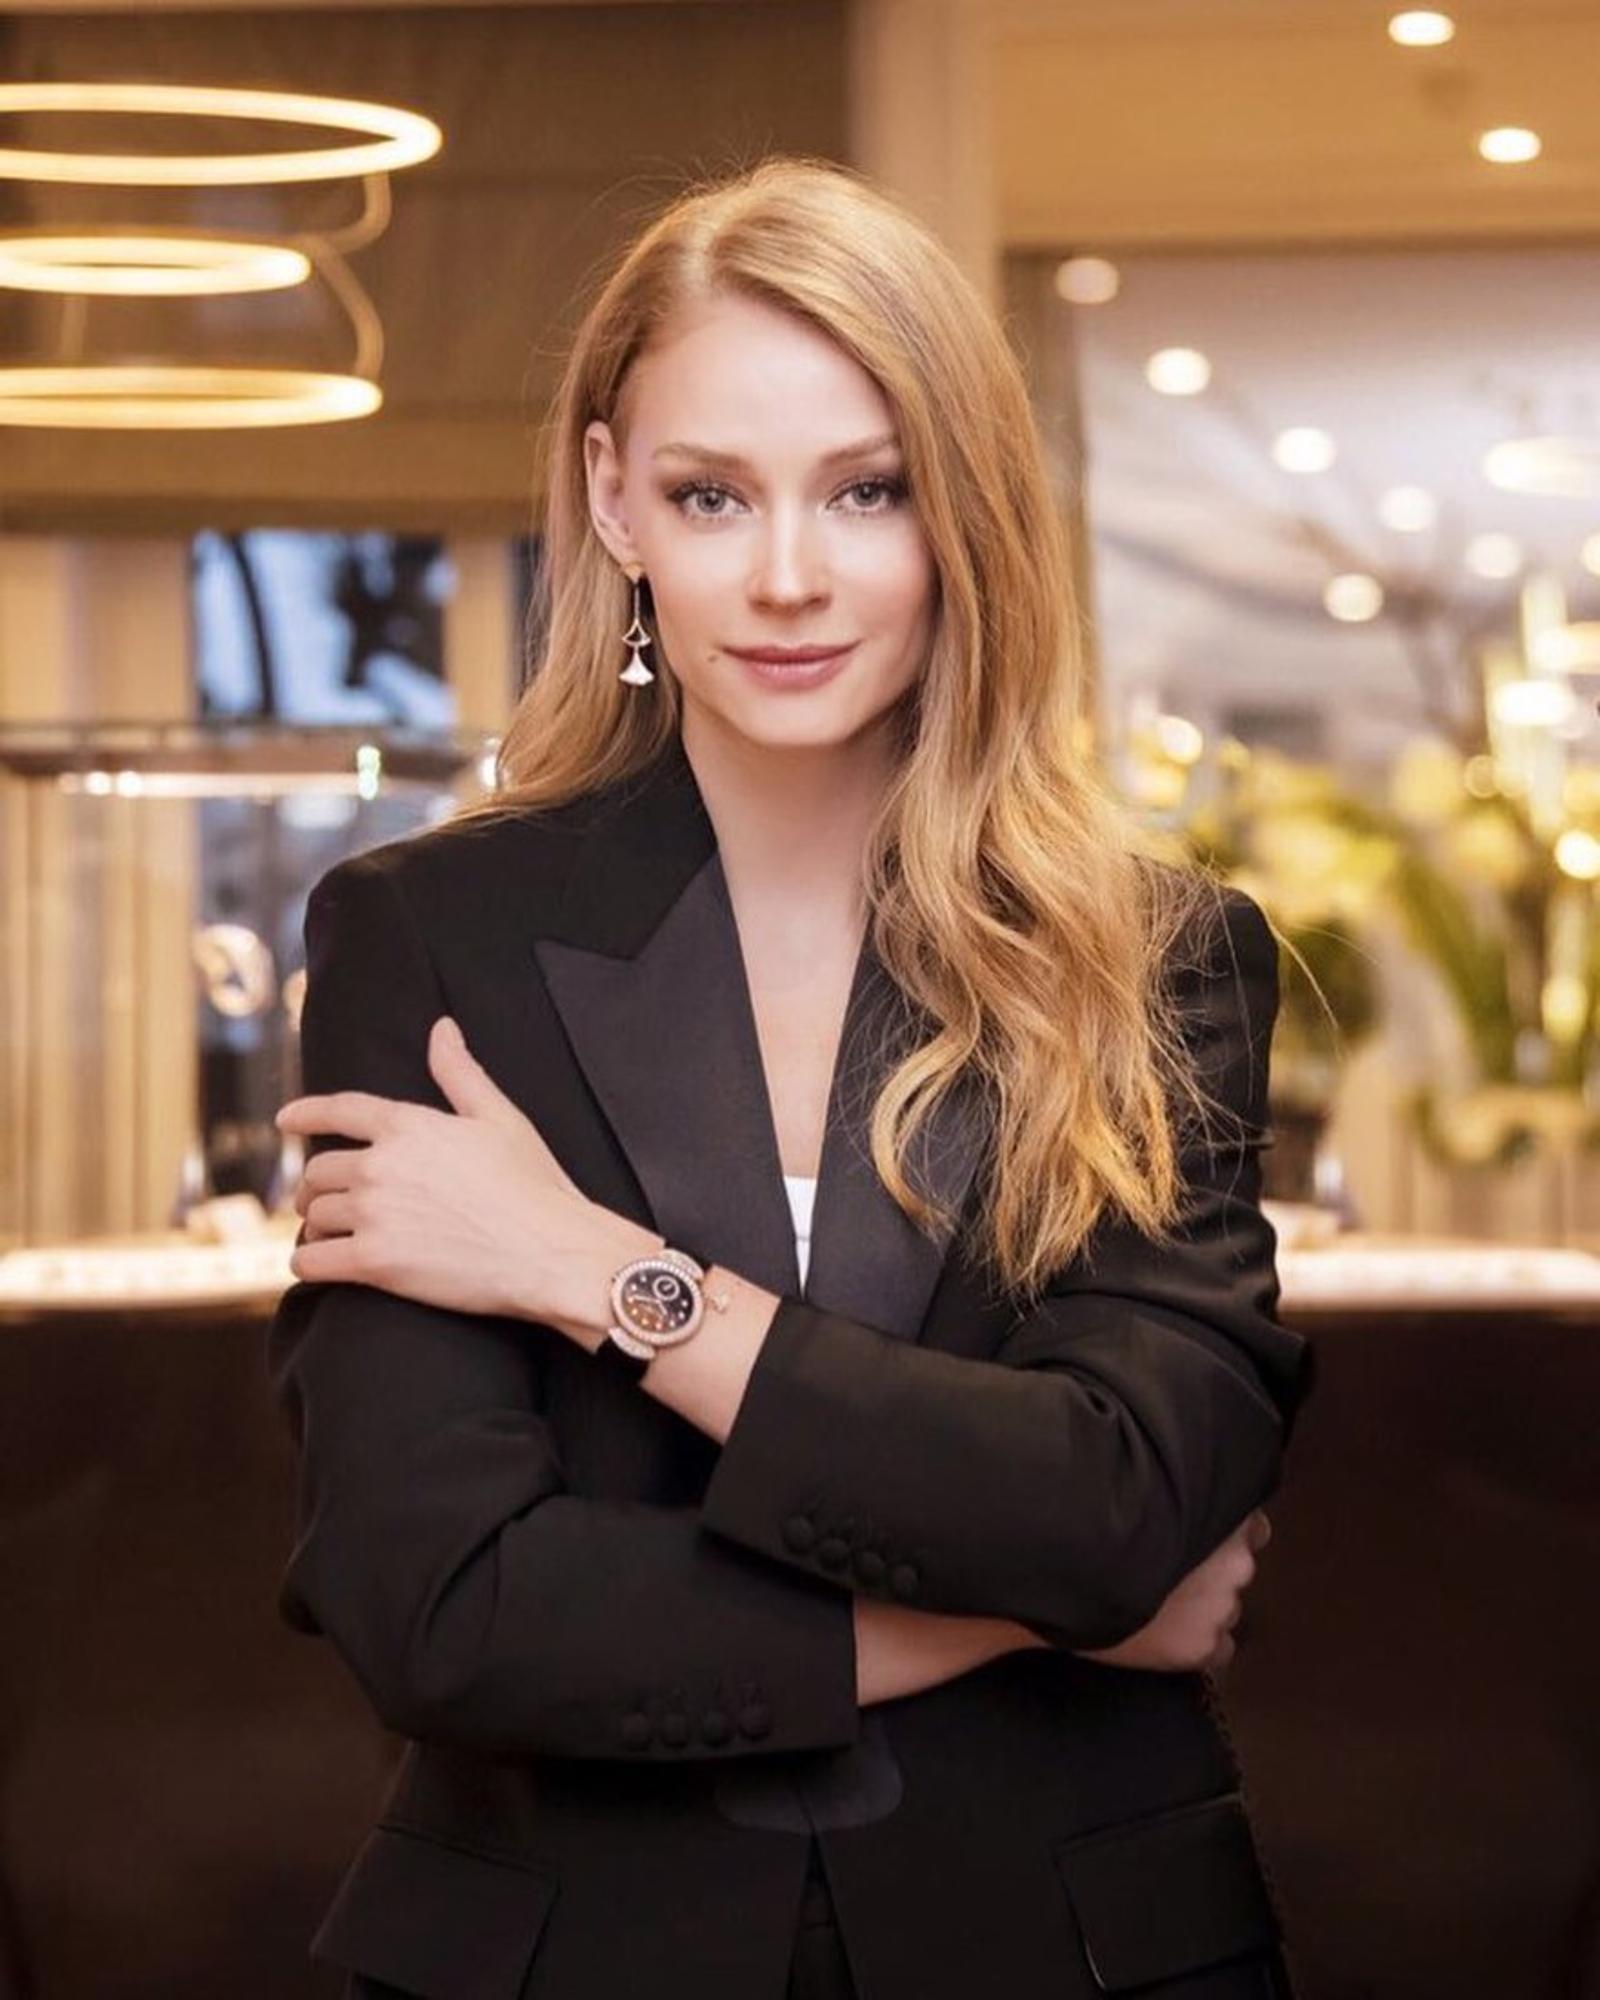 Почти Волочкова! Светлана Ходченкова продемонстрировала потрясающую растяжку